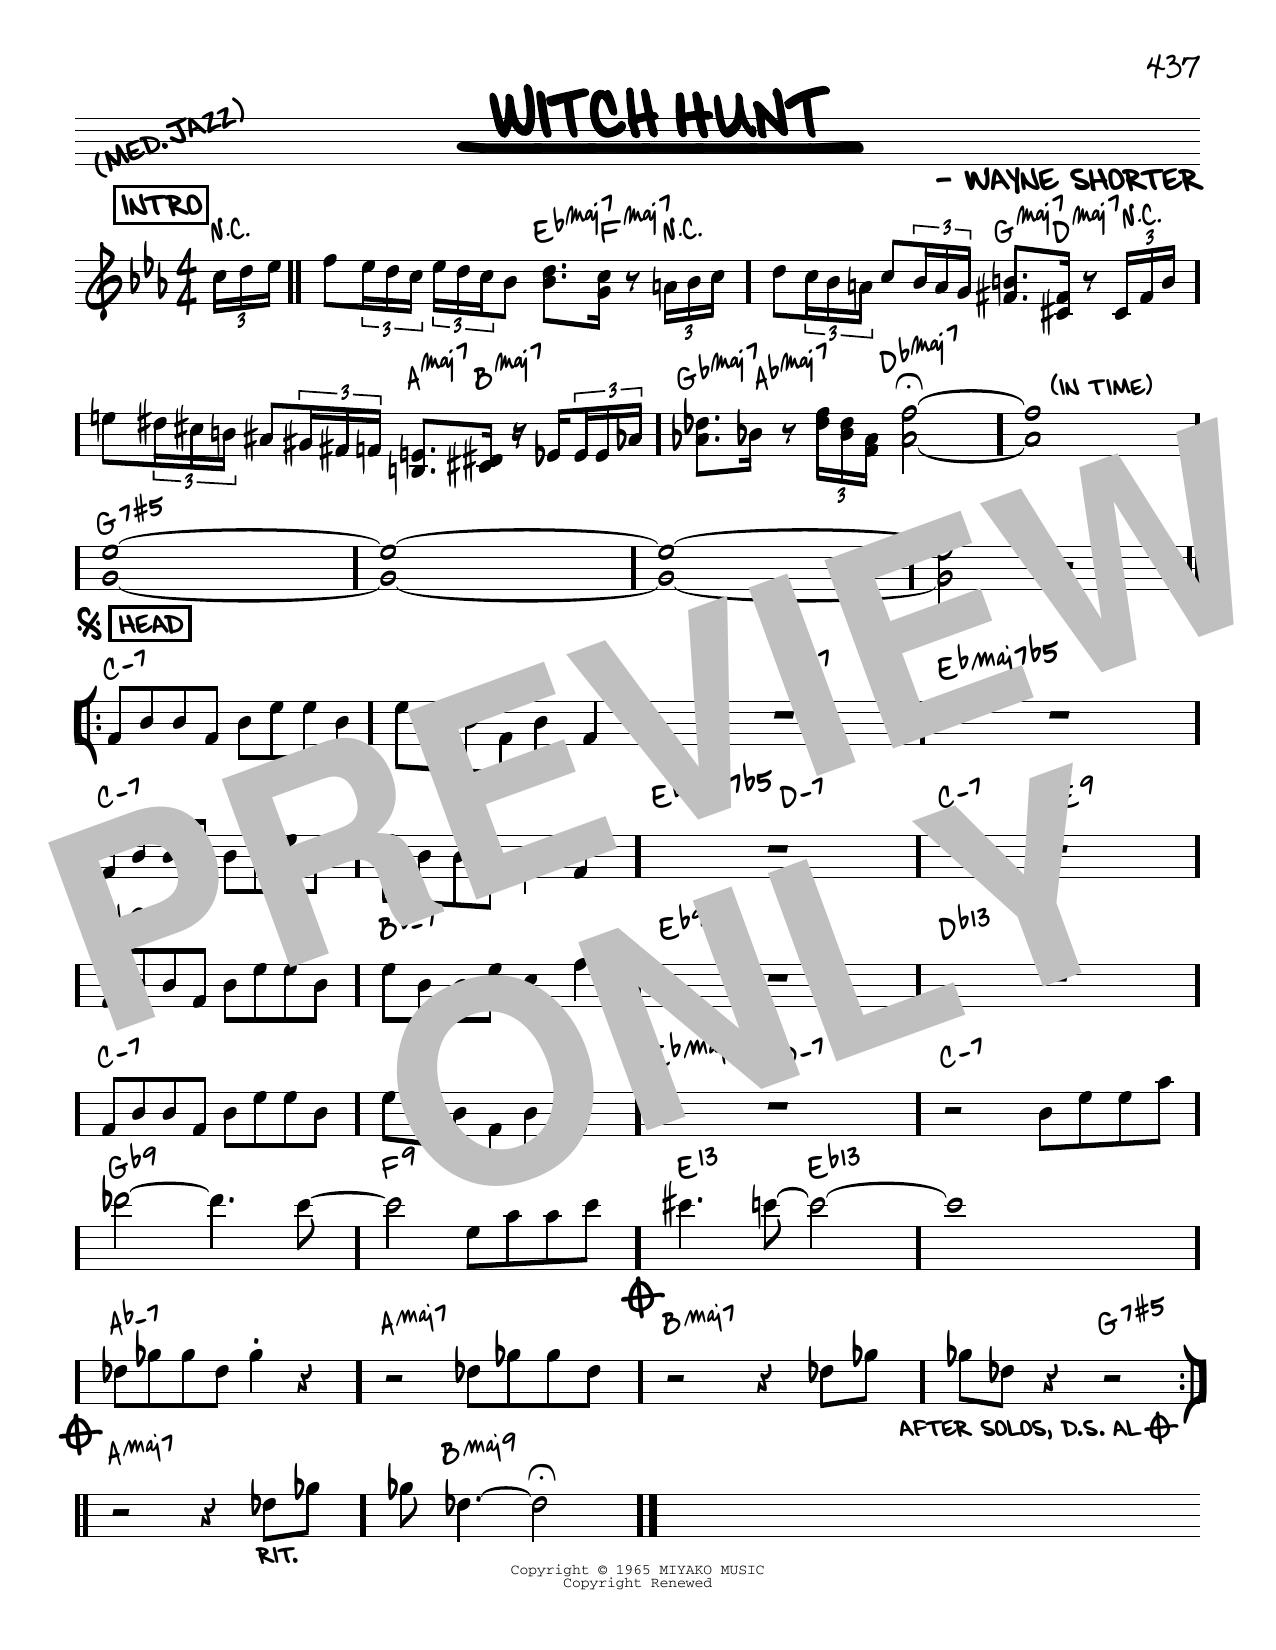 Wayne Shorter Witch Hunt [Reharmonized version] (arr. Jack Grassel) sheet music notes printable PDF score